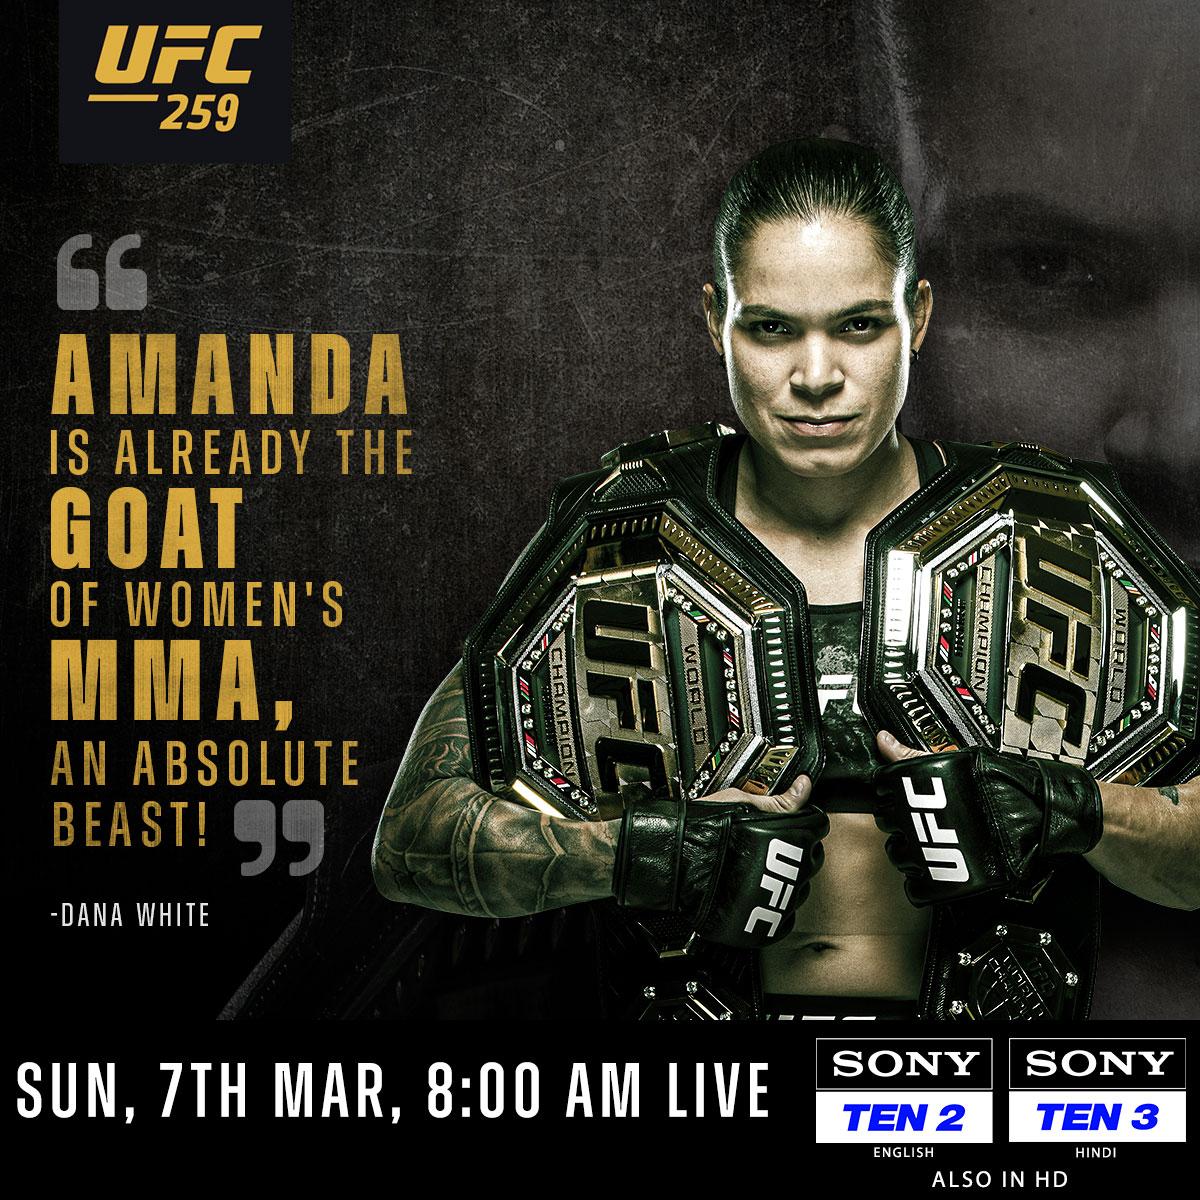 Is Amanda Nunes the GOAT 🐐 of w̶o̶m̶e̶n̶'̶s̶ MMA? 🤨  Watch the Brazilian in action against Megan Anderson at #UFC259 🤩💪🏻  📺 Sony TEN 2 (ENG) & Sony TEN 3 (HIN) 📅 SUN, 7th MAR ⌚ 8:00 AM  #SirfSonyPeDikhega #UFC #MMA #ChampionVsChampion #Nunes #Fight